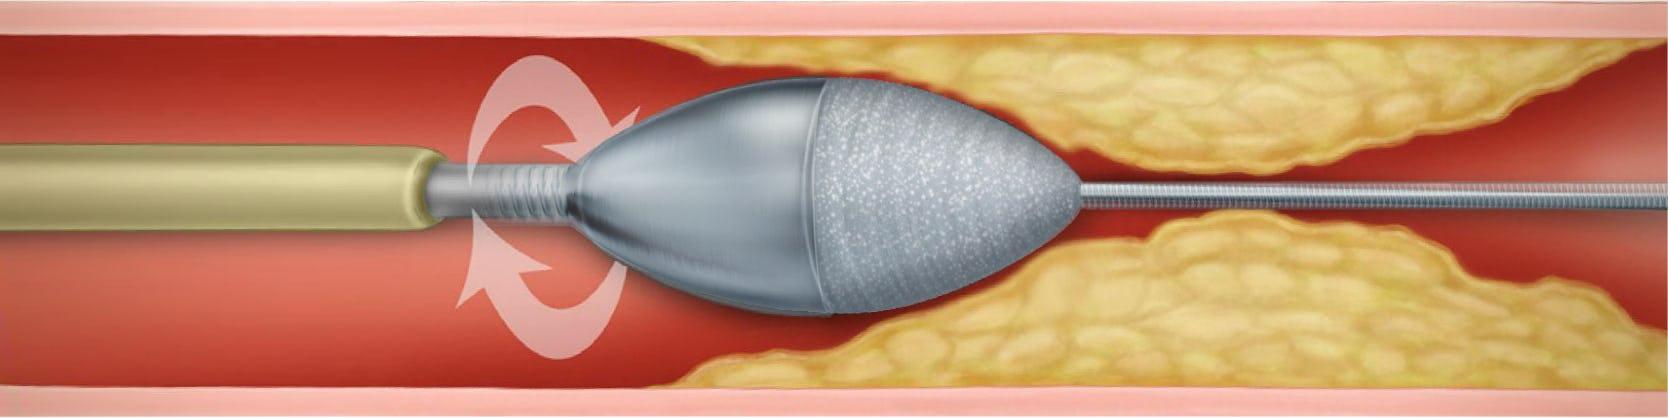 Rotablație | Centrele Ares | Inovatie in Cardiologie